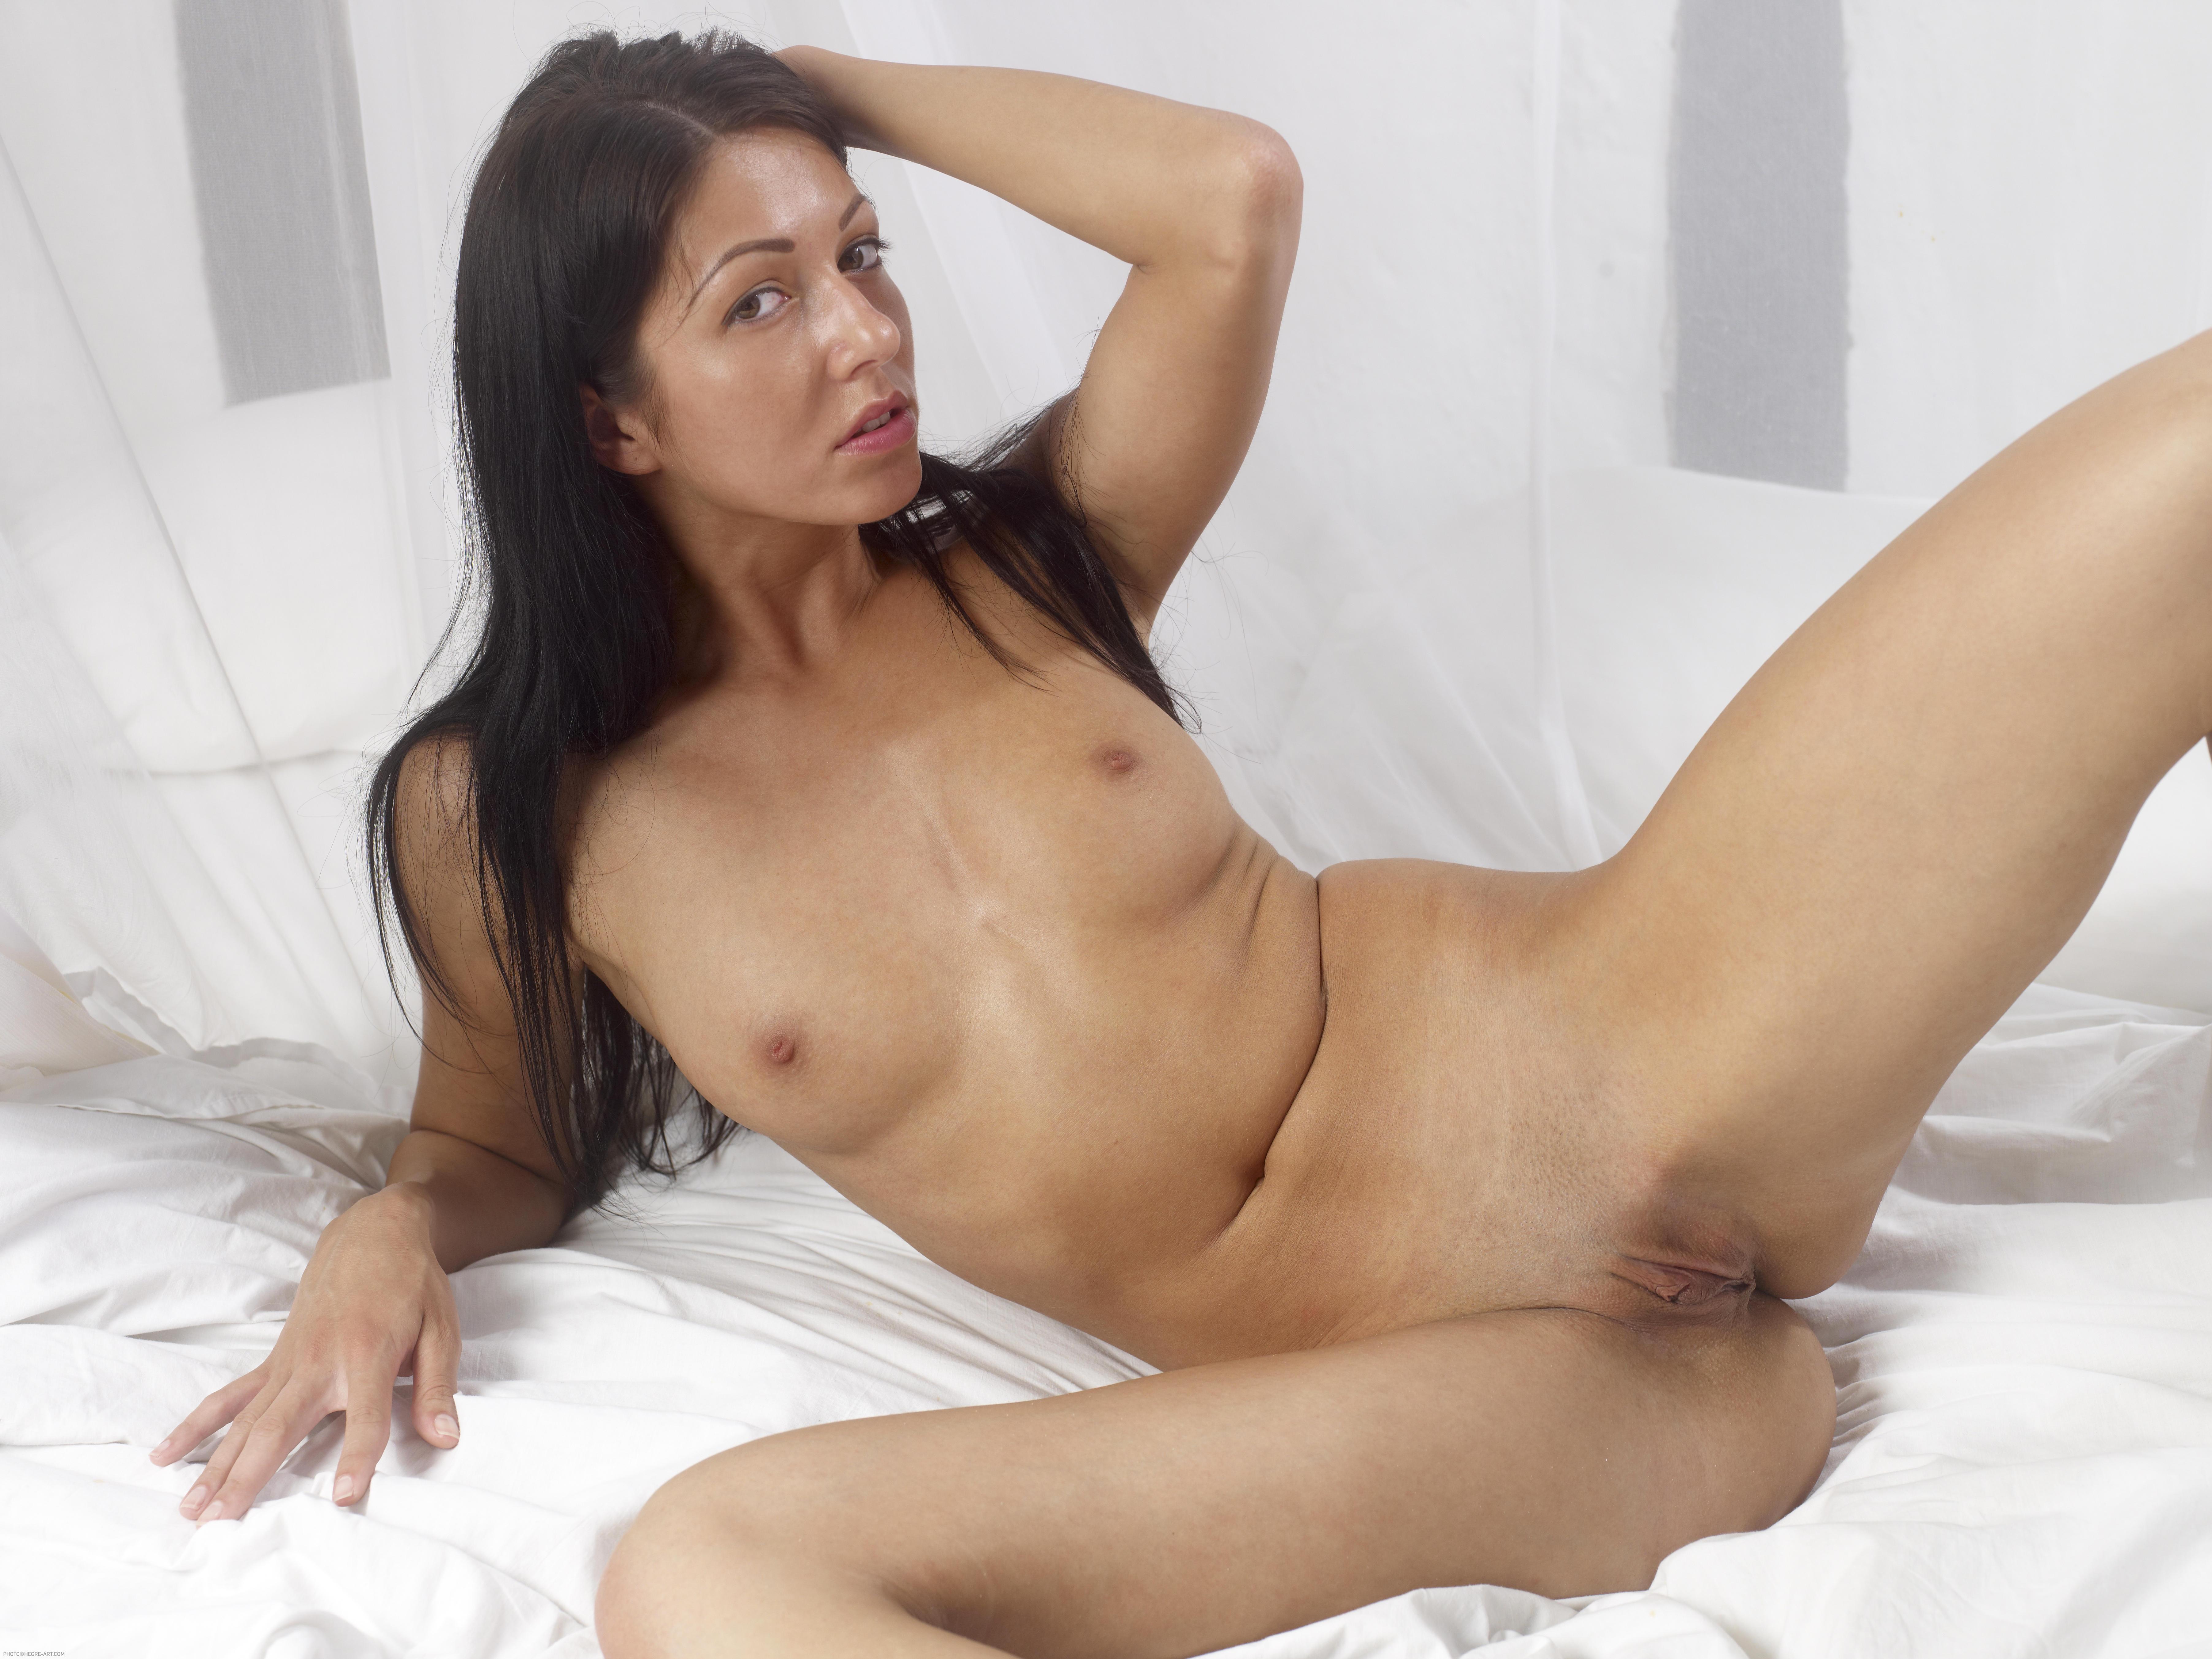 xx boy girl hot body photo